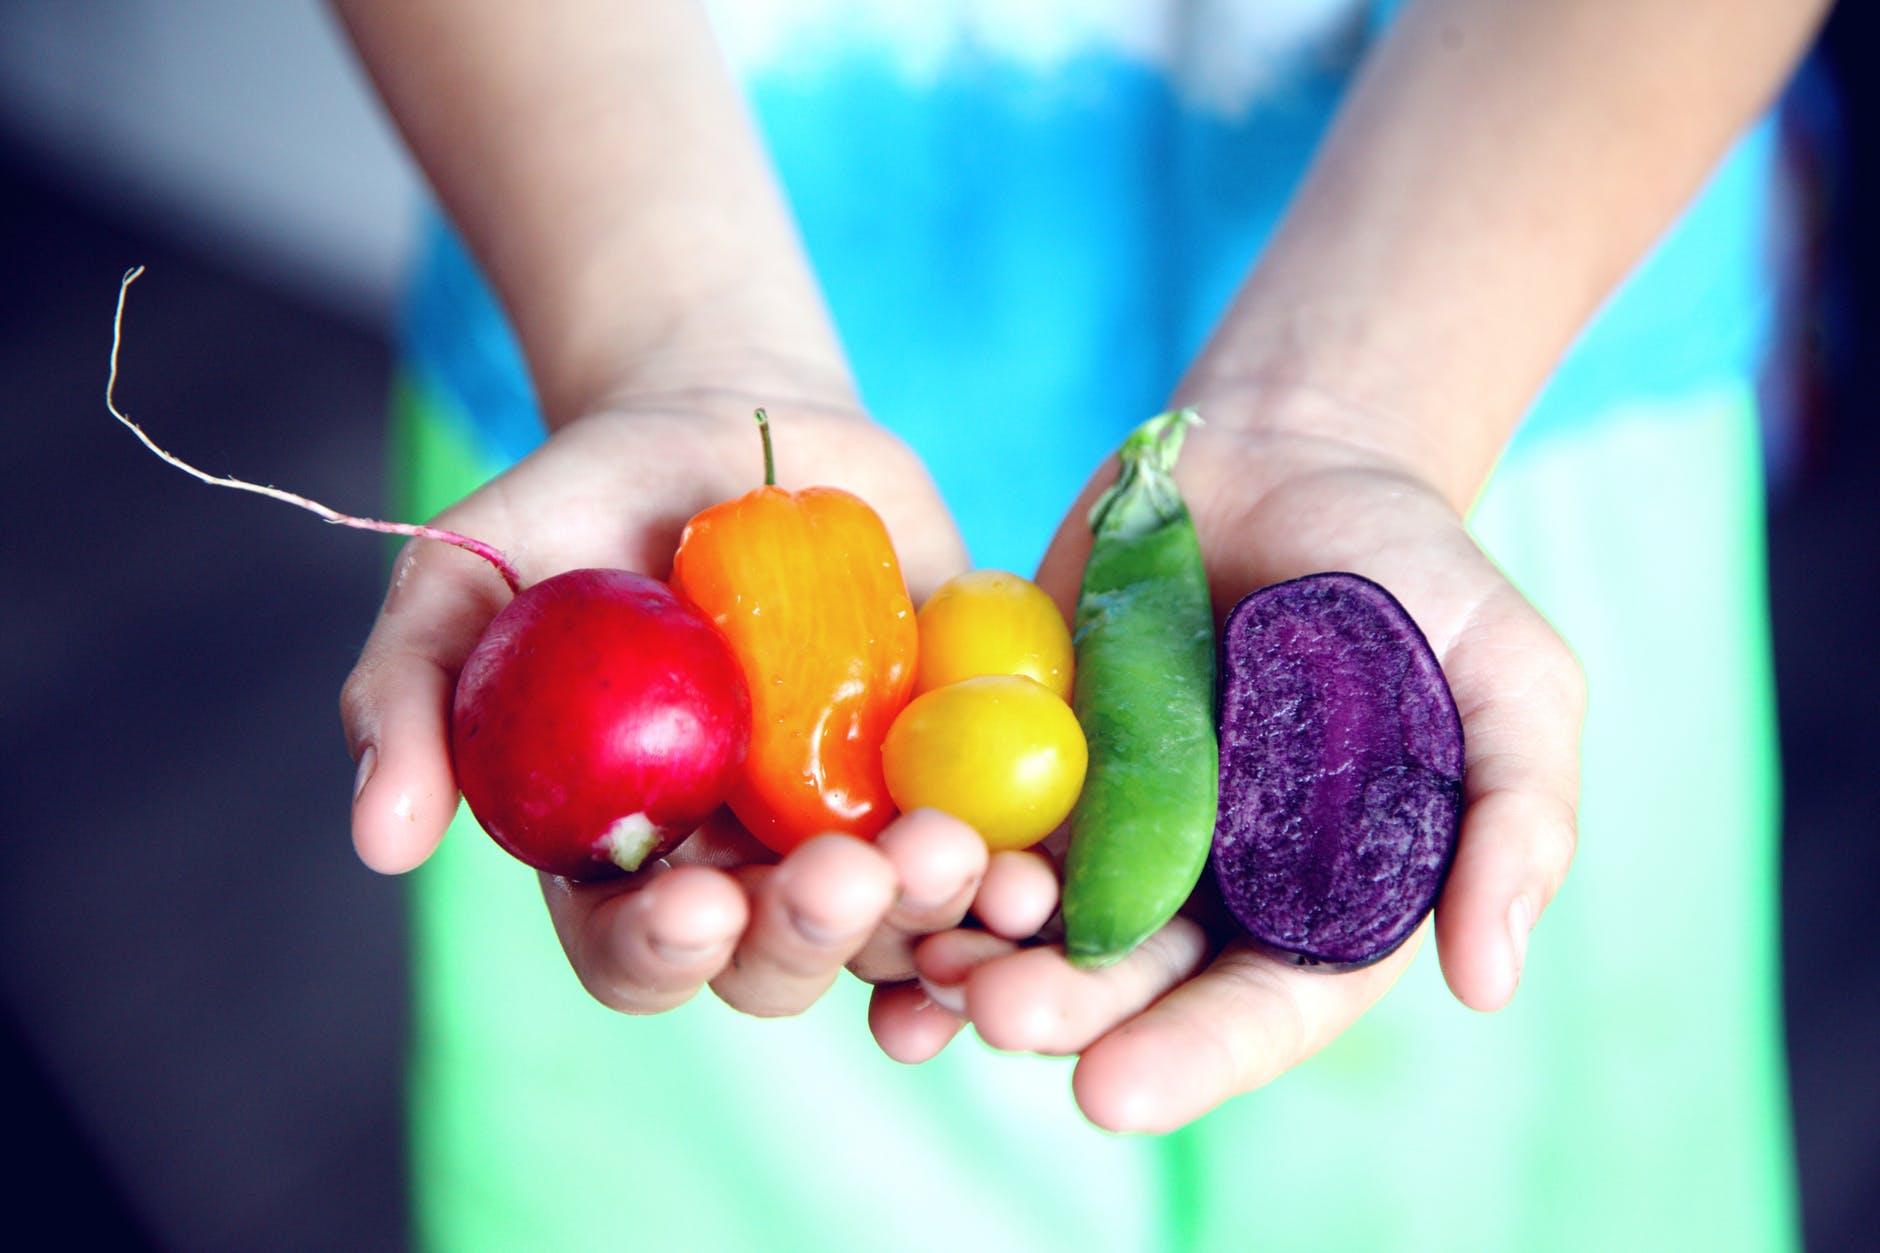 veg in hand